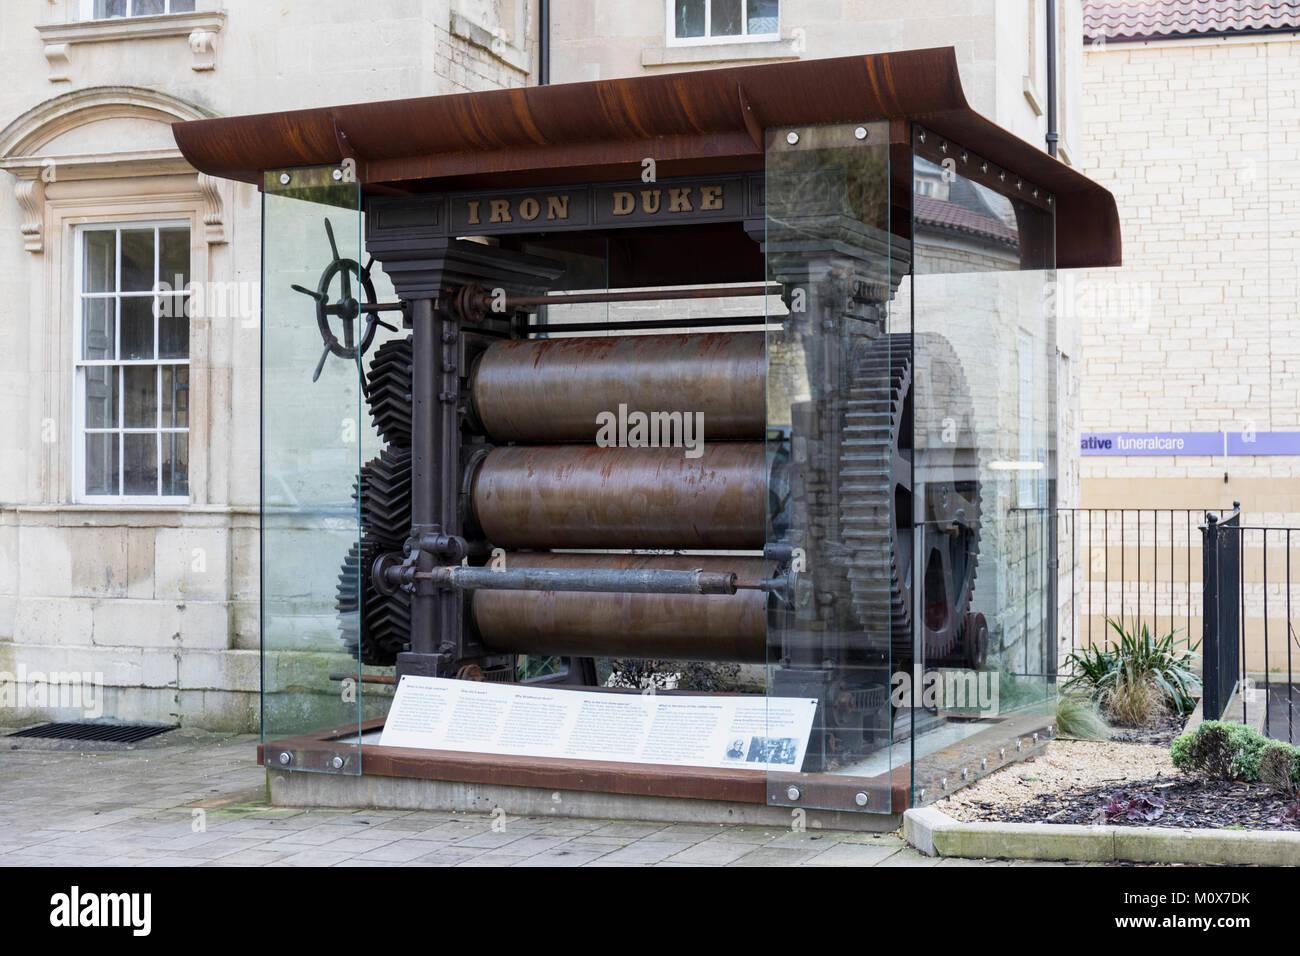 Iron Duke, Bradford on Avon, Wiltshire, England - Stock Image